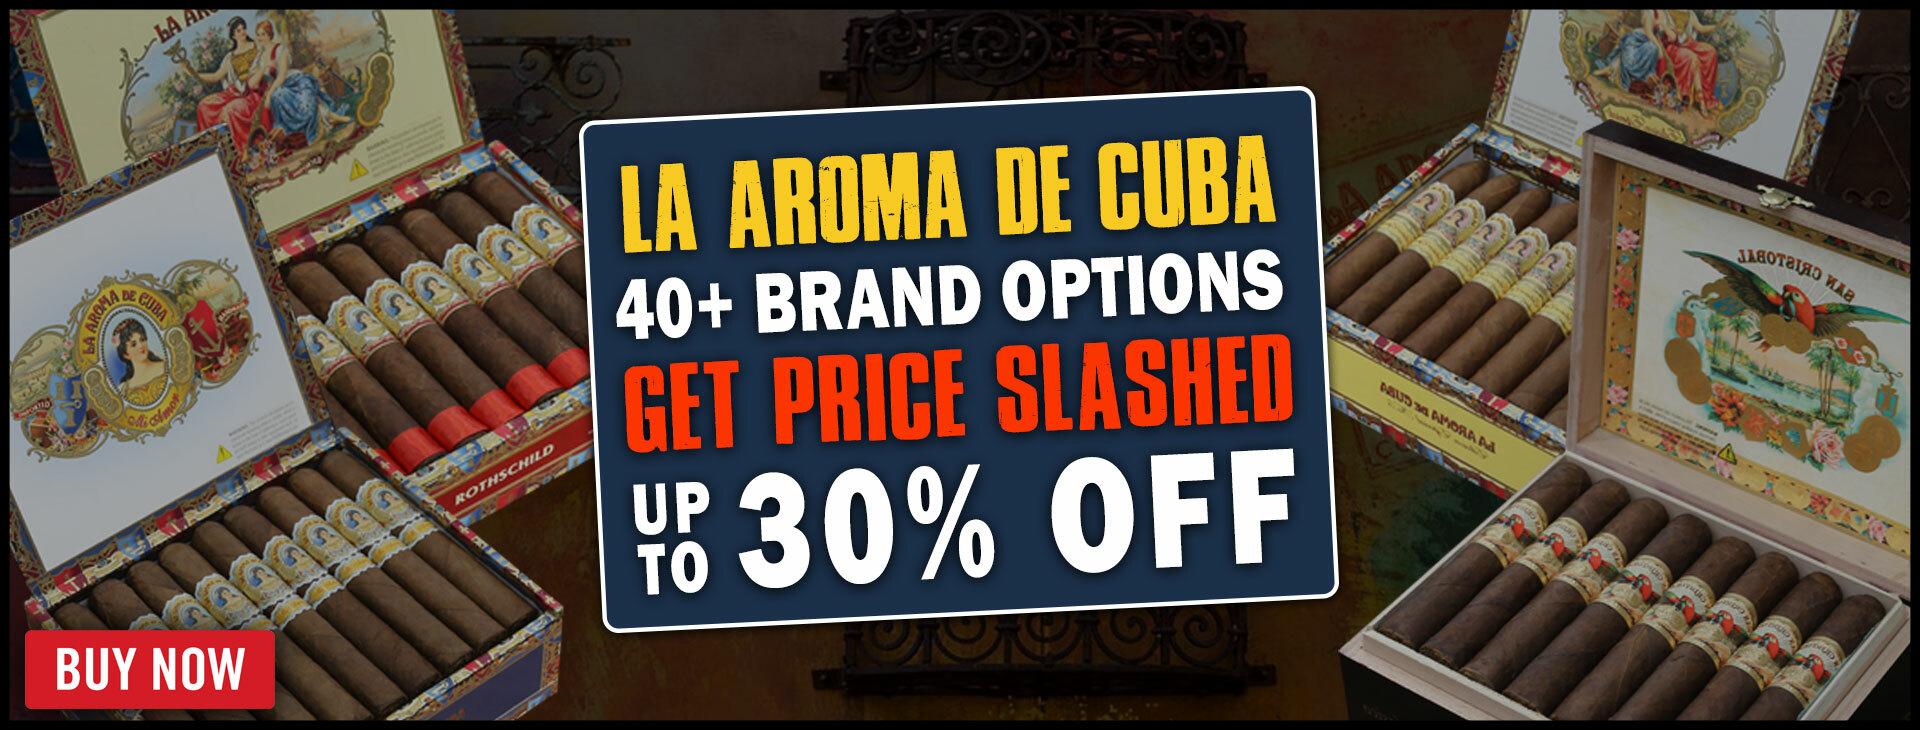 RARE 30% OFF LA AROMA DE CUBA & SAN CRISTOBAL!